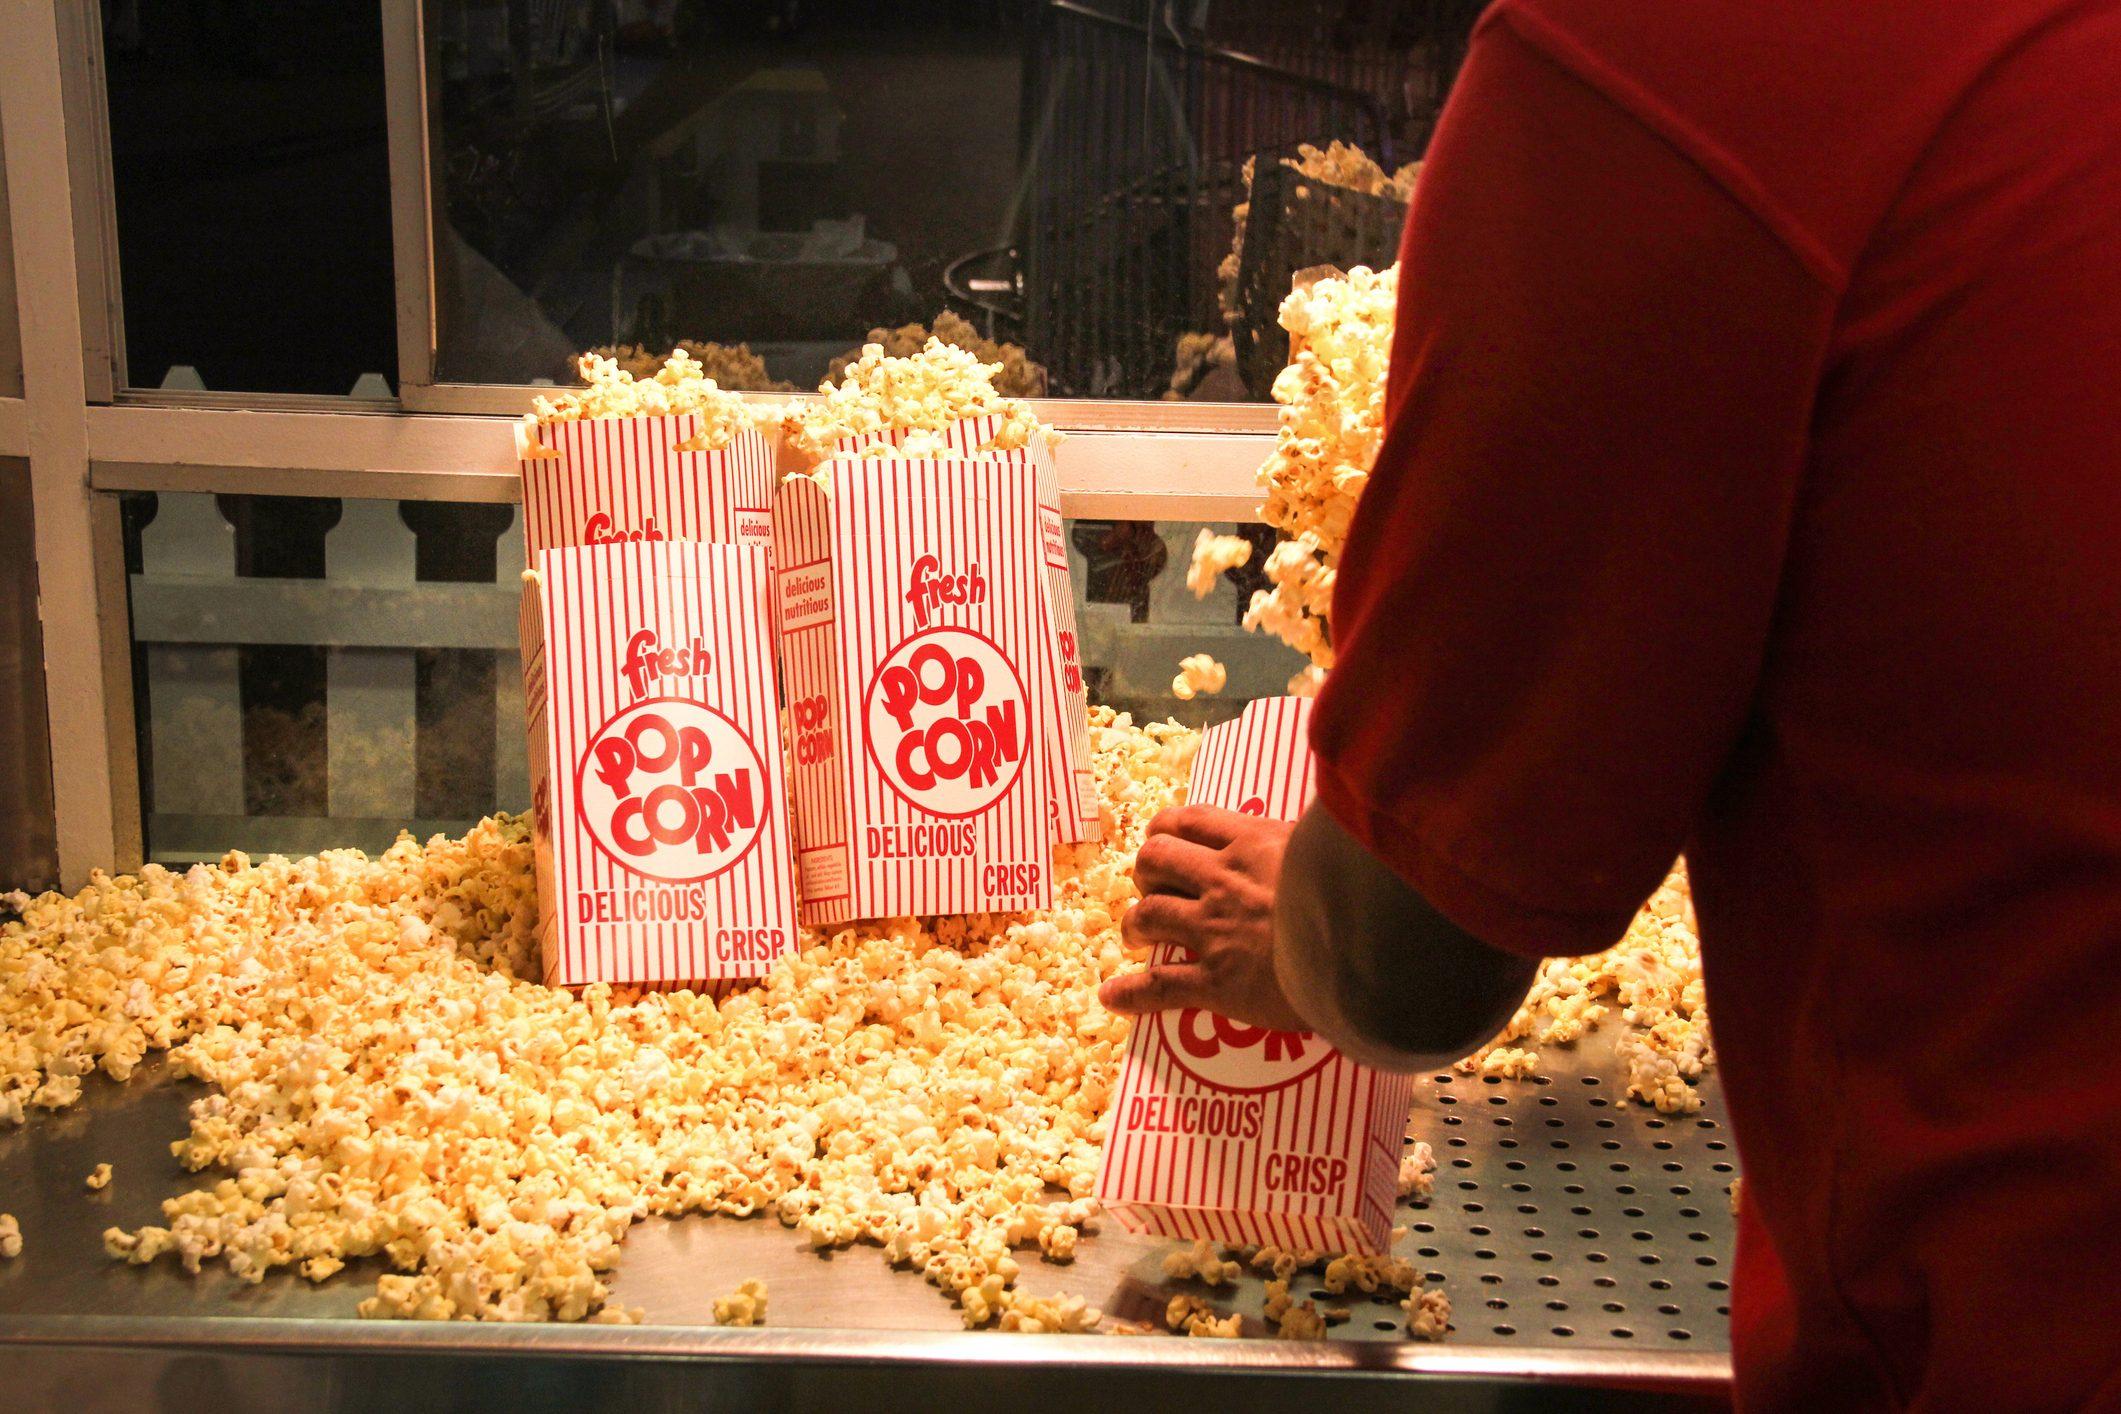 Popcorn vendor inside a concession stand